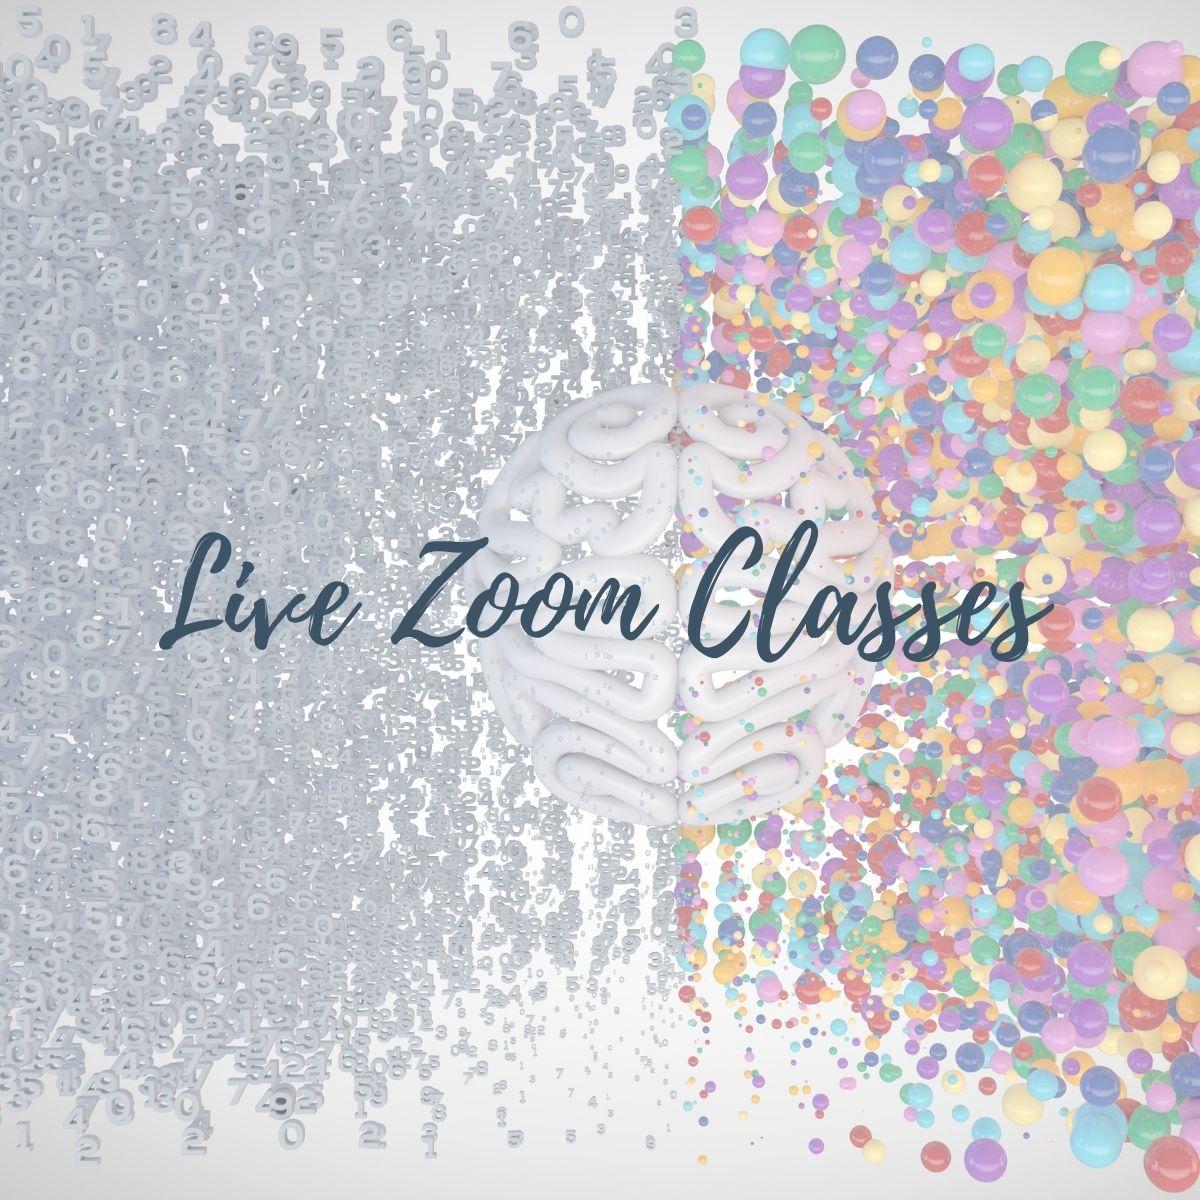 Live Zoom Classes3